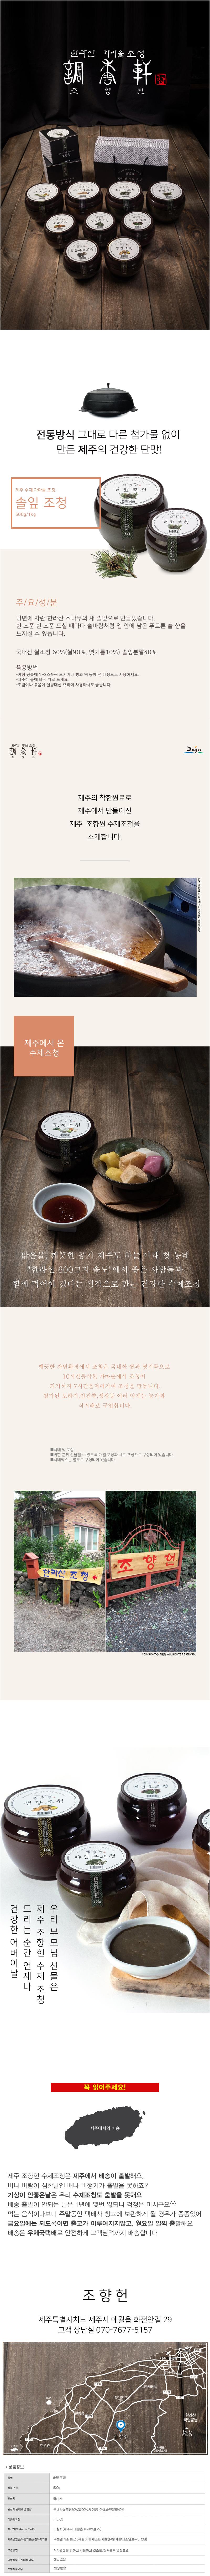 johyahuen_page_solrib_500g.jpg